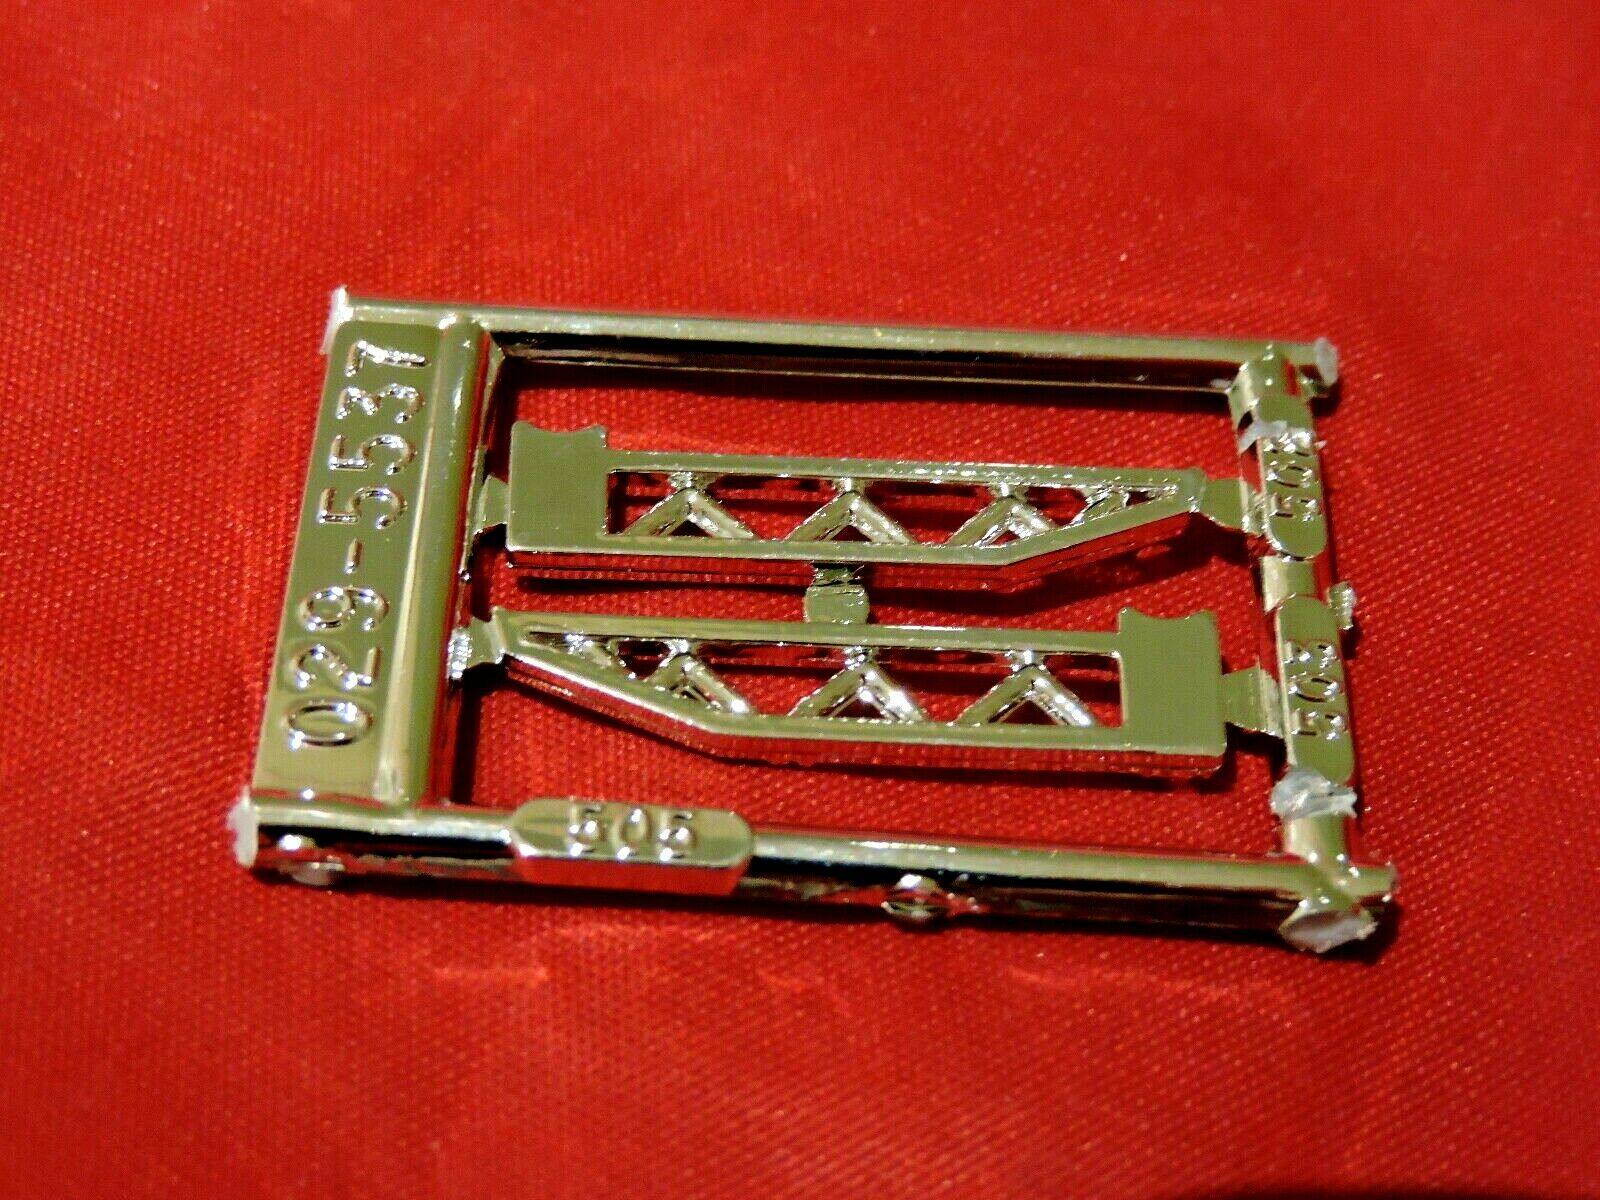 Car Parts - Model Car Parts AMT Chrome Traction Bars 1/25